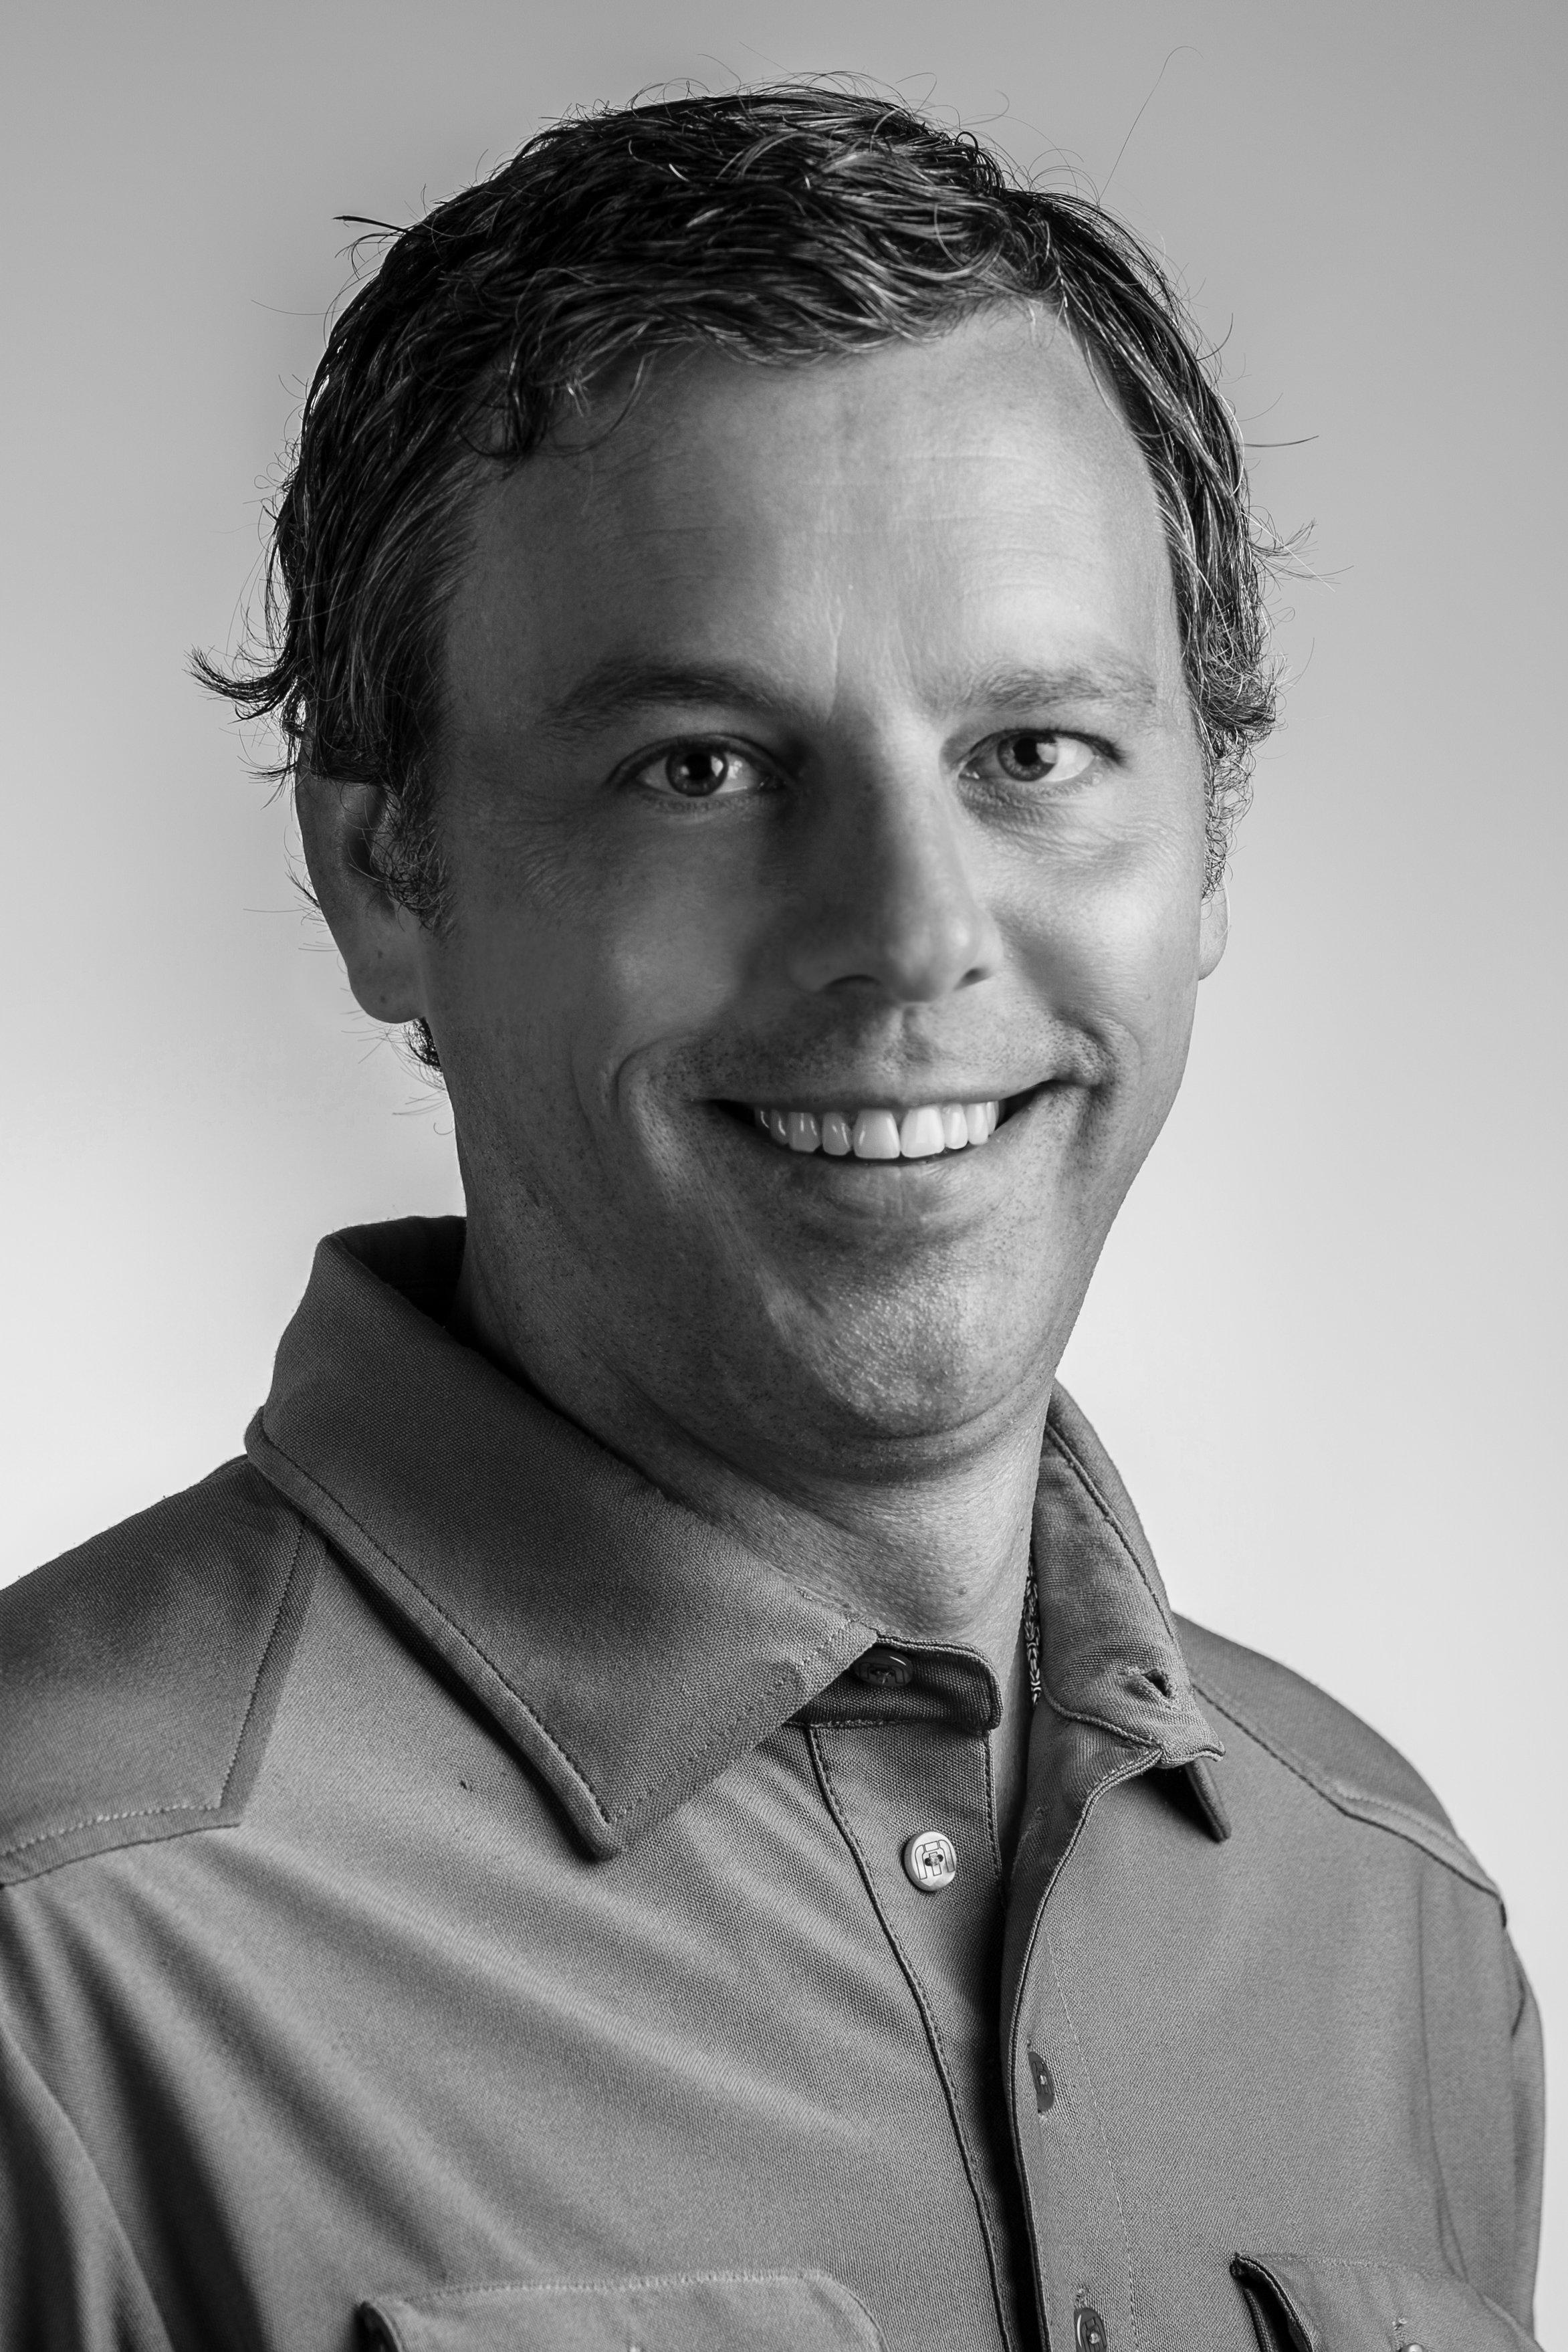 Joseph C. Scandroli